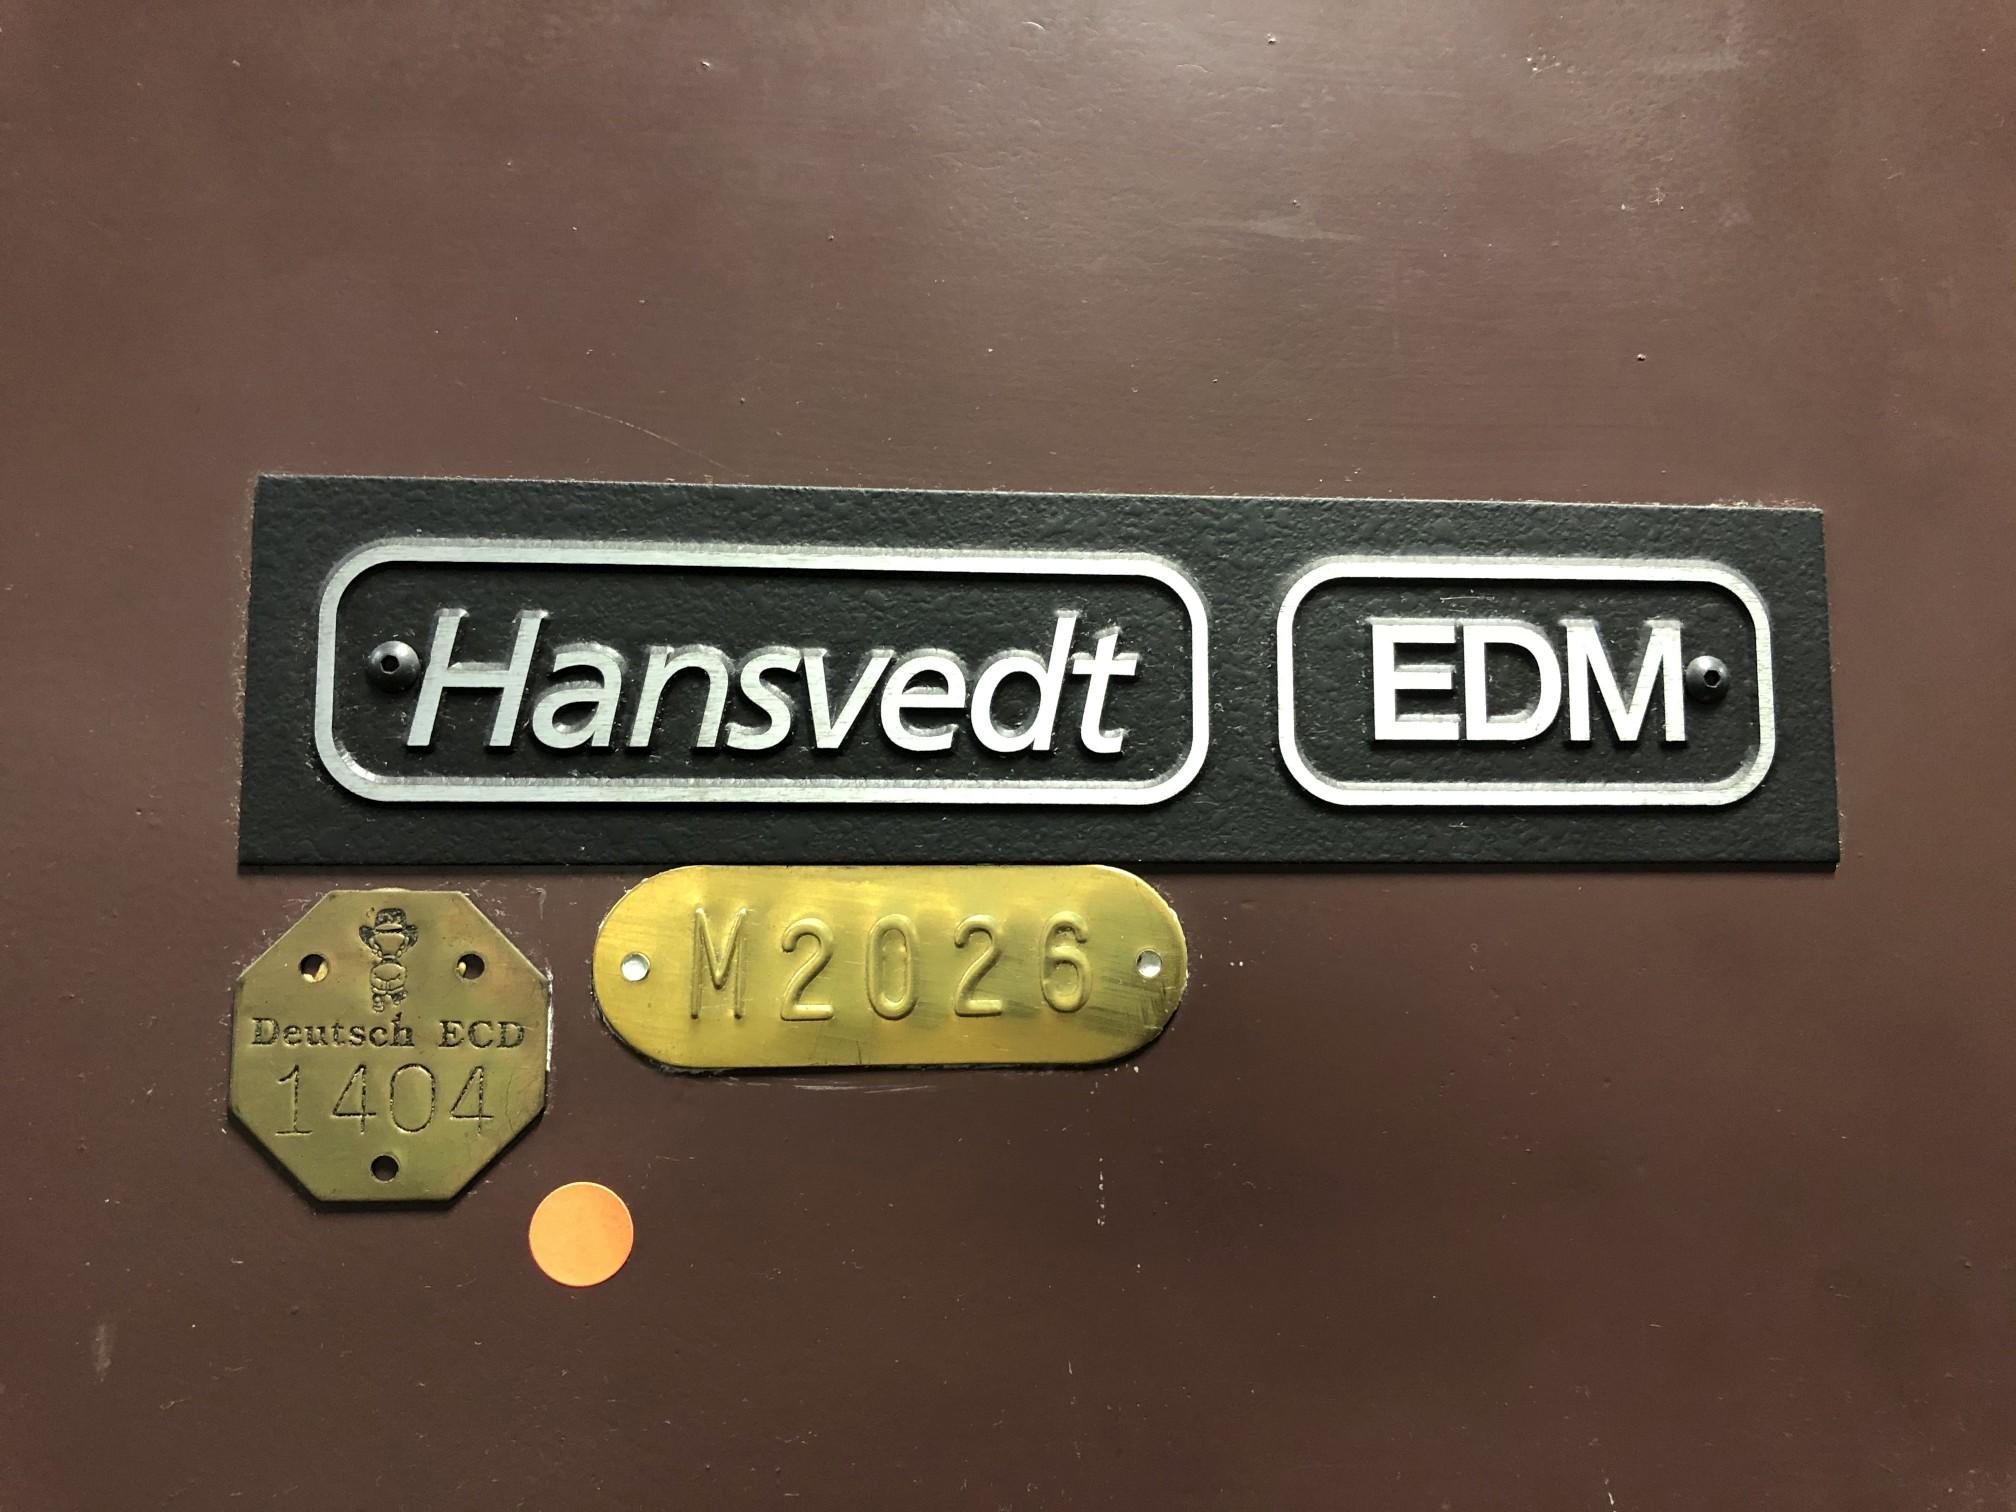 1997 Hansvedt EDM Machine - Image 18 of 18